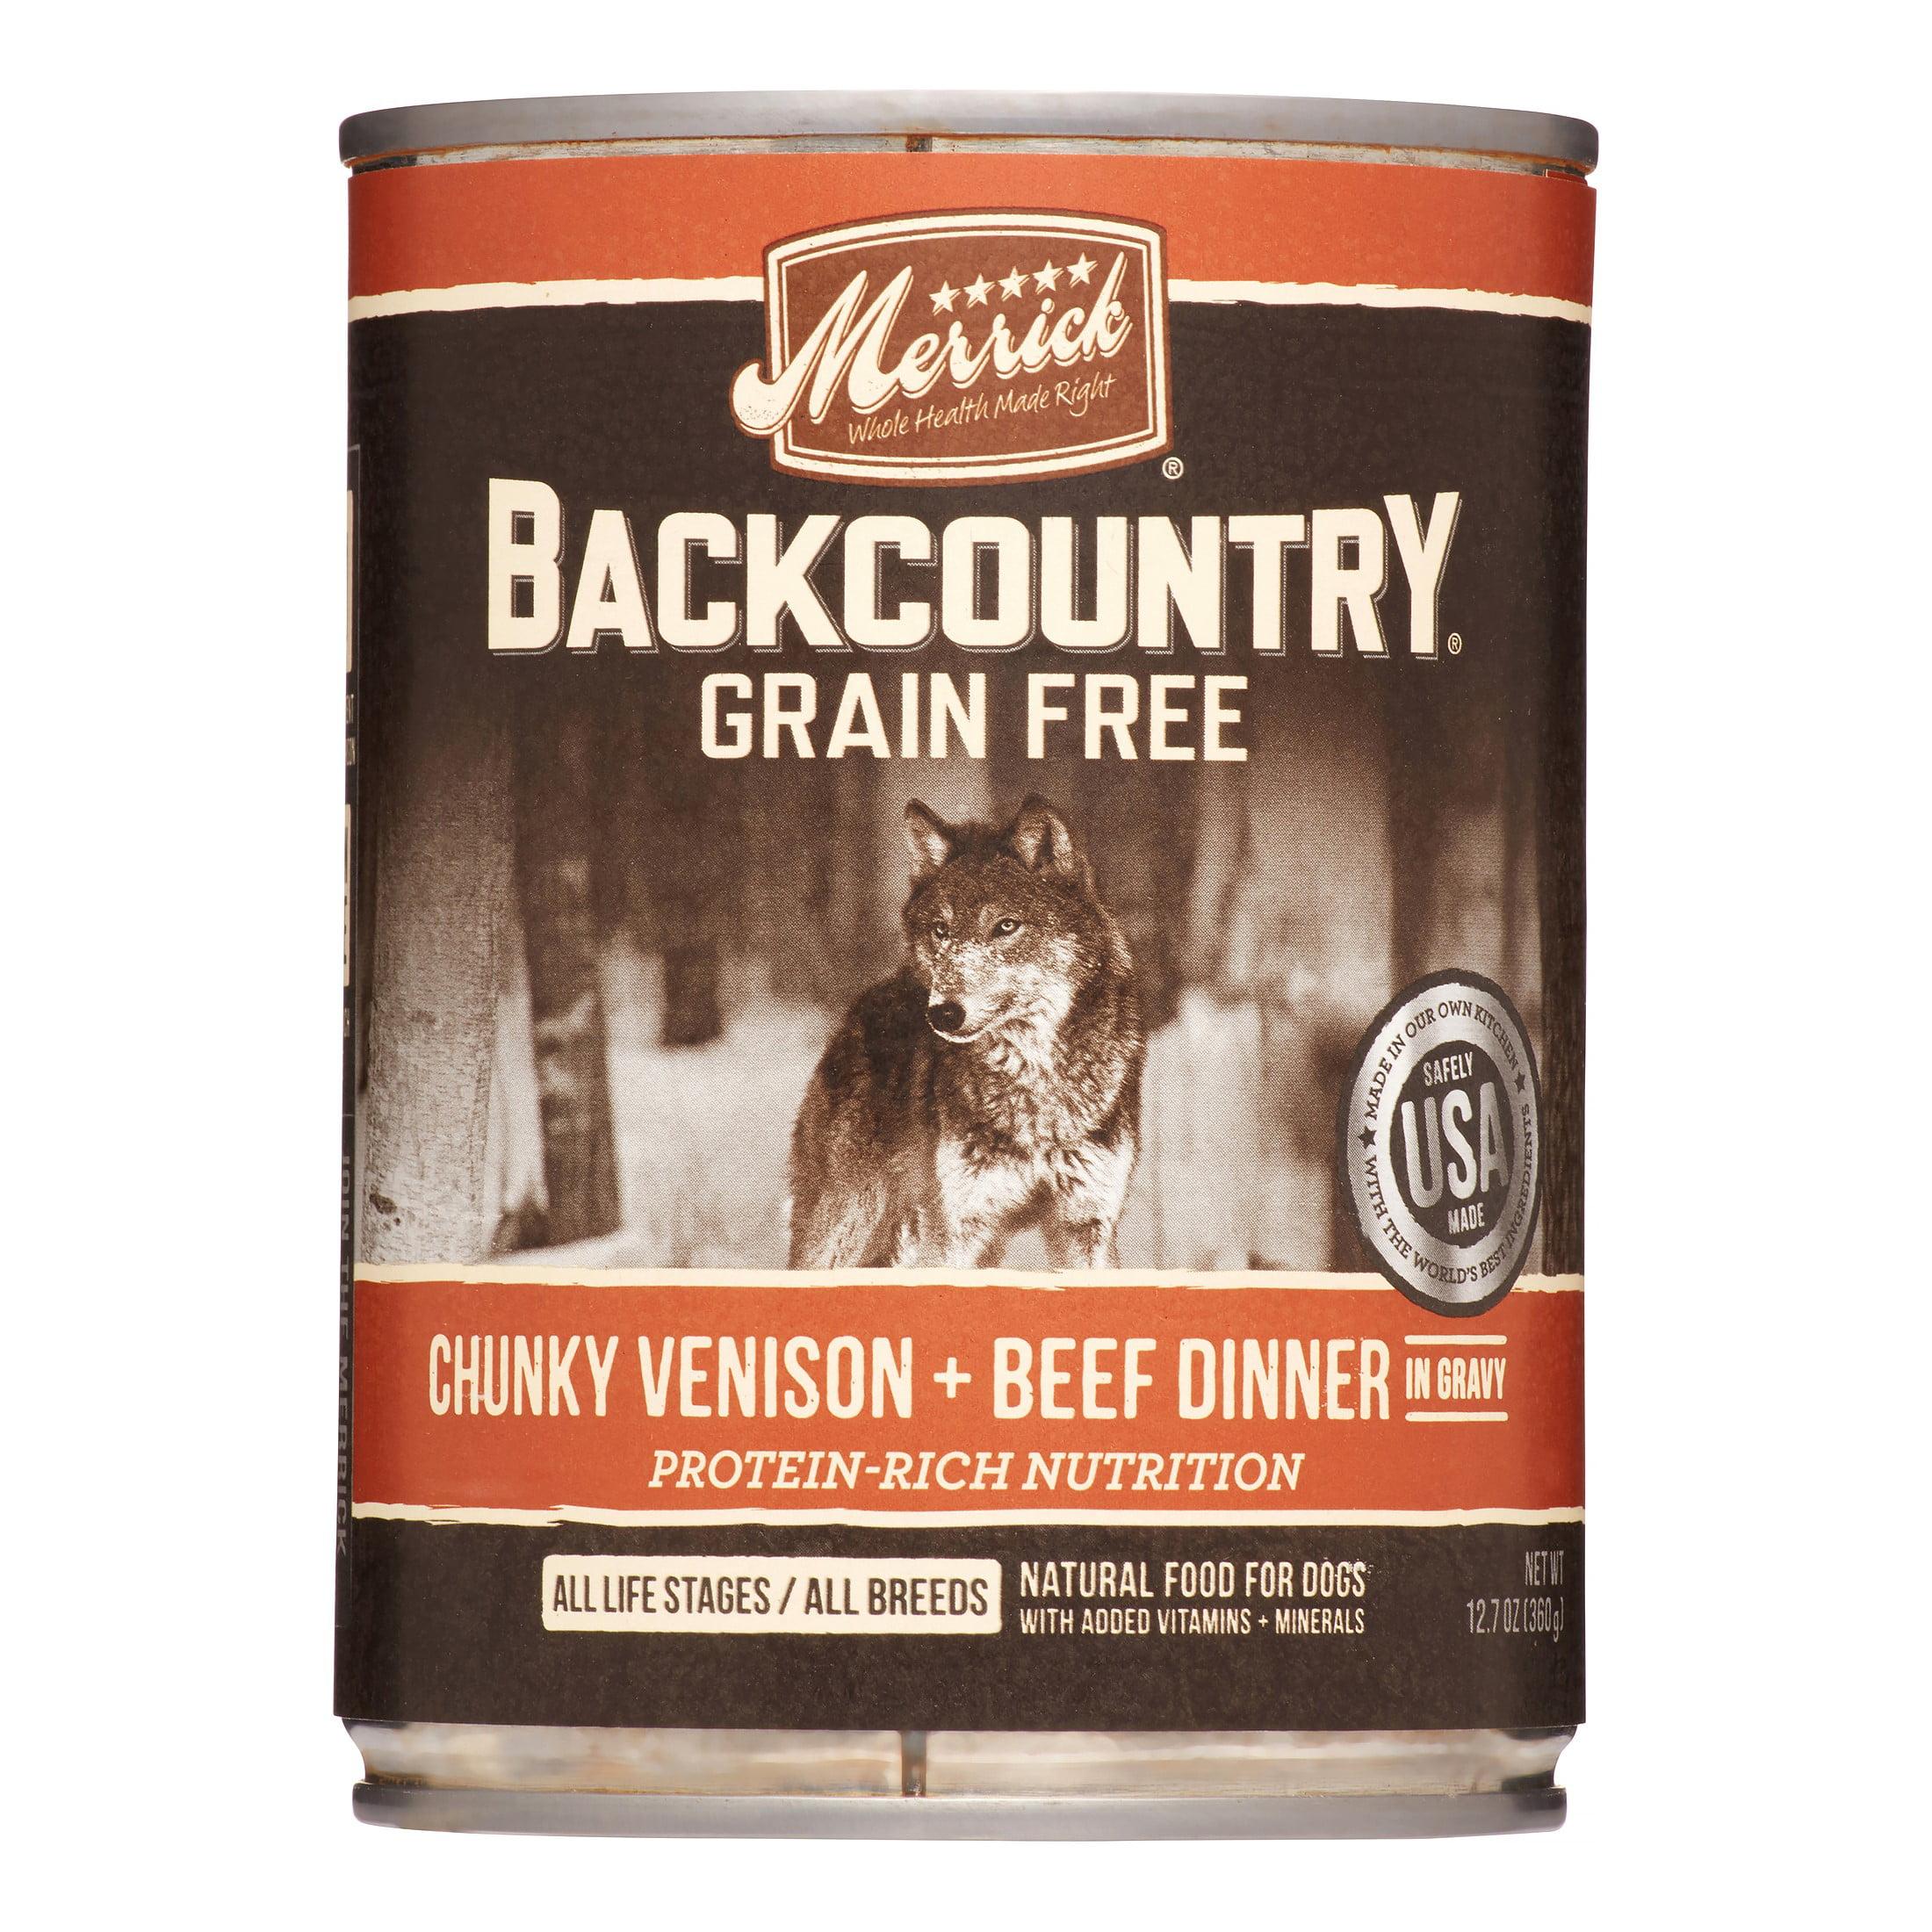 Merrick Backcountry Grain-Free Chunky Venison + Beef Dinner Wet Dog Food, 12.7 oz